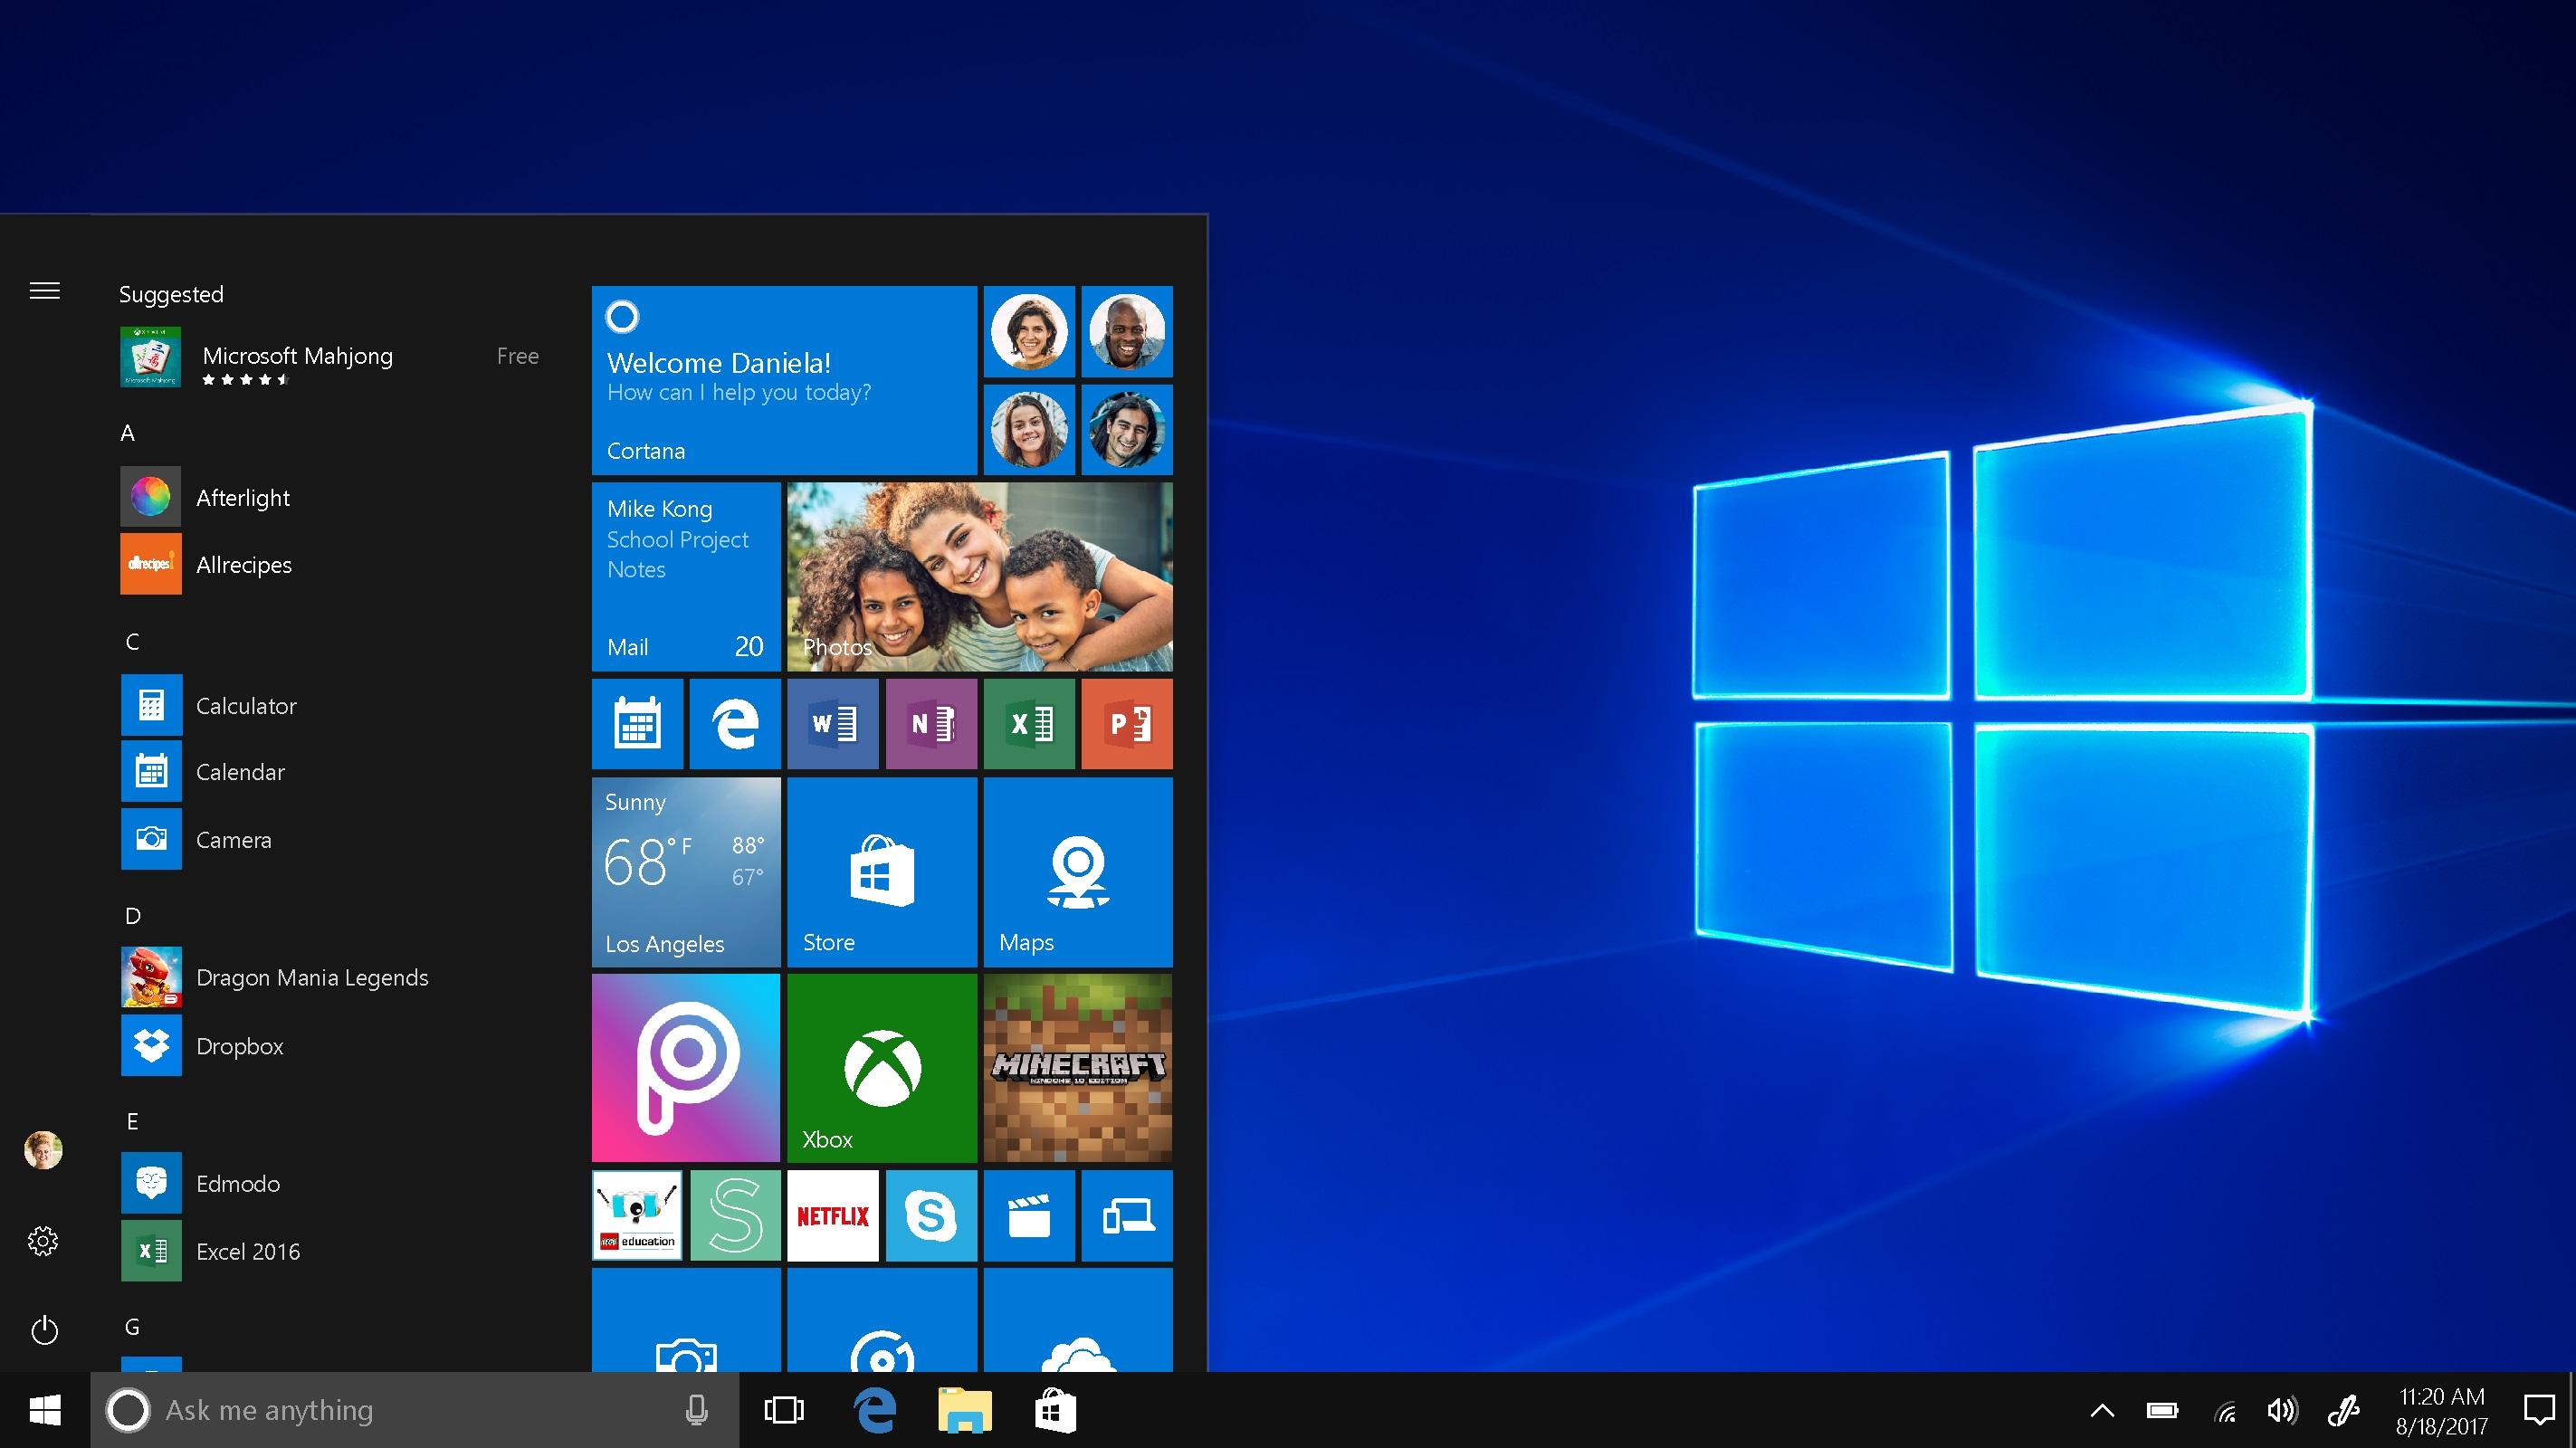 Windows_10_image_for_blog